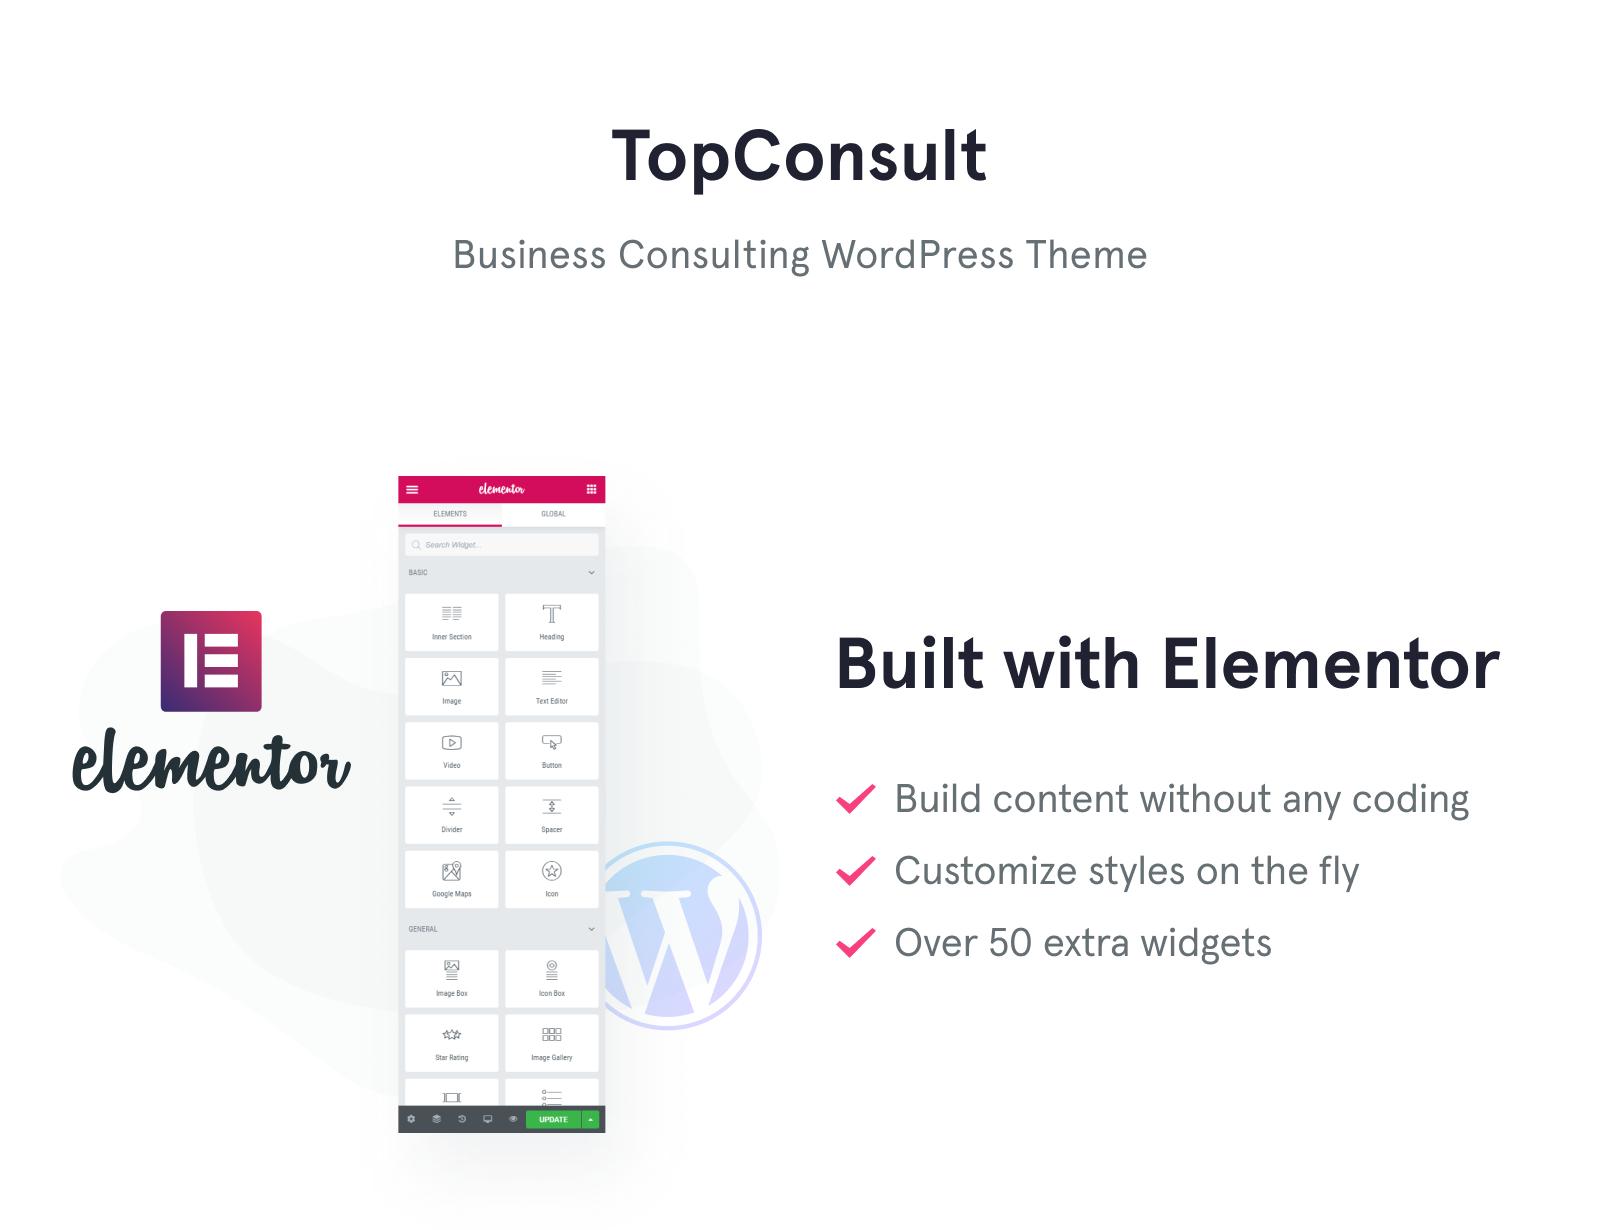 TopConsult - Business Consulting WordPress Theme WordPress Theme